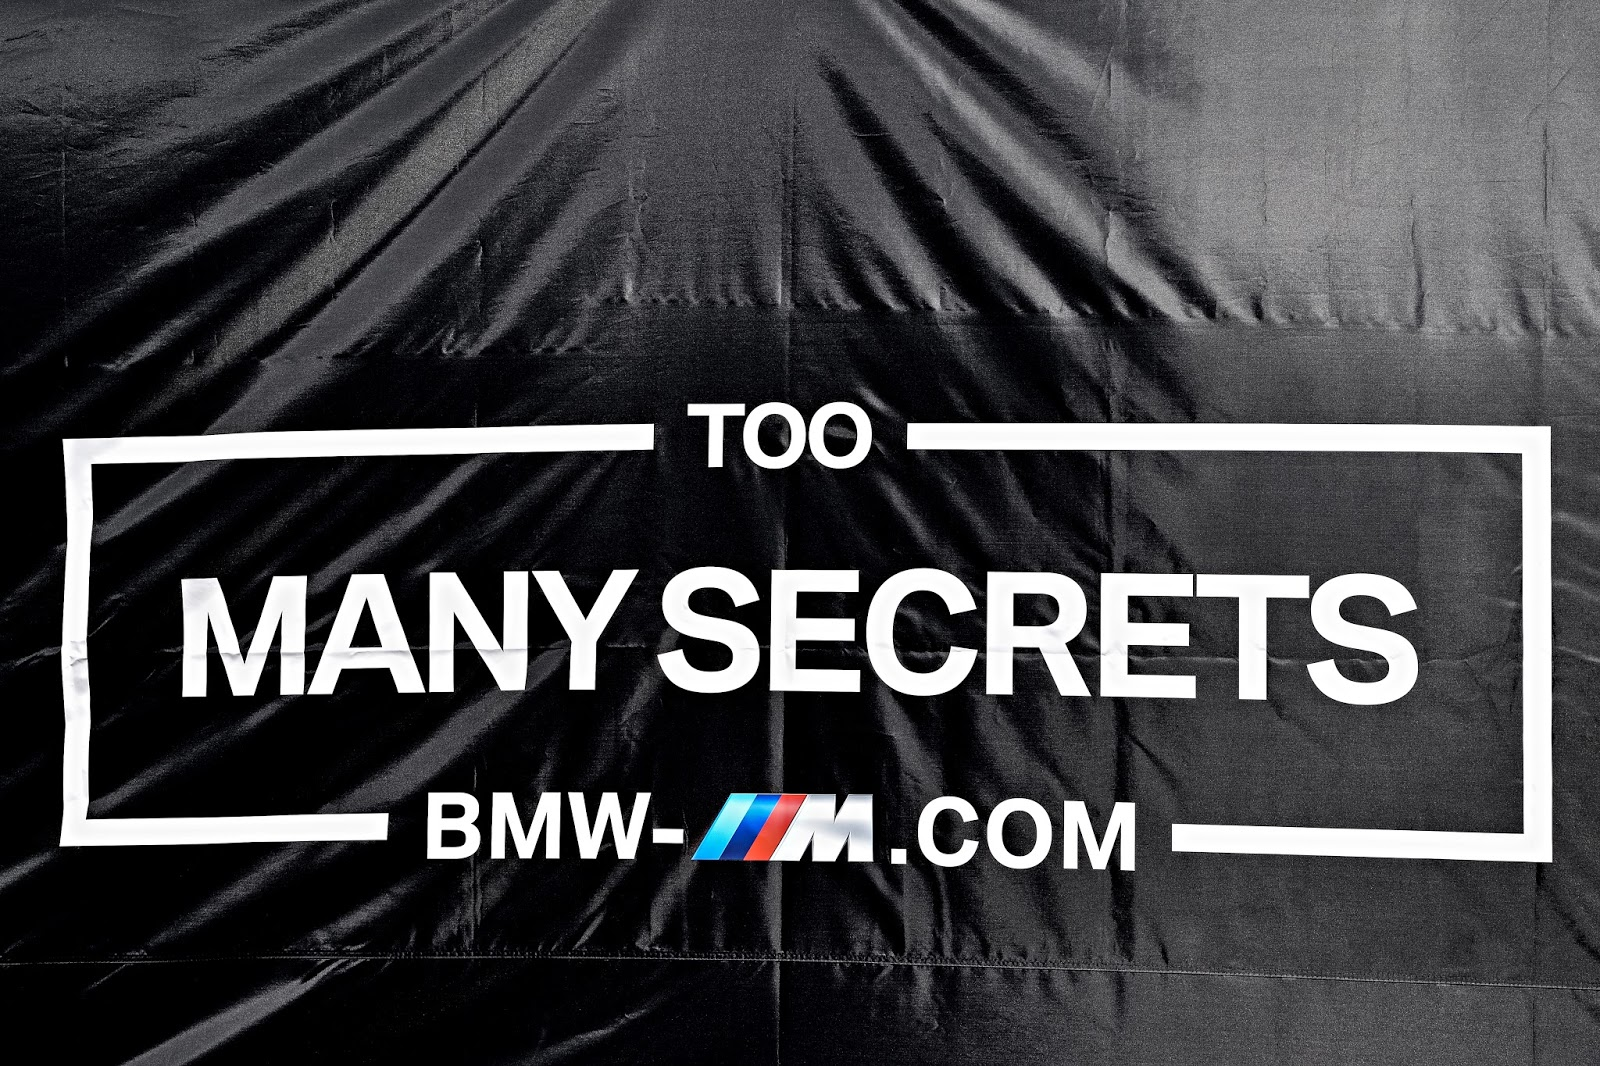 P90261475 highRes m festival bmw m8 pr 1 H ναυαρχίδα της BMW, η M8 θα είναι οκτακύλινδρη BMW, BMW Concept, BMW Concept 8 Series, BMW M, BMW M Performance, BMW M8